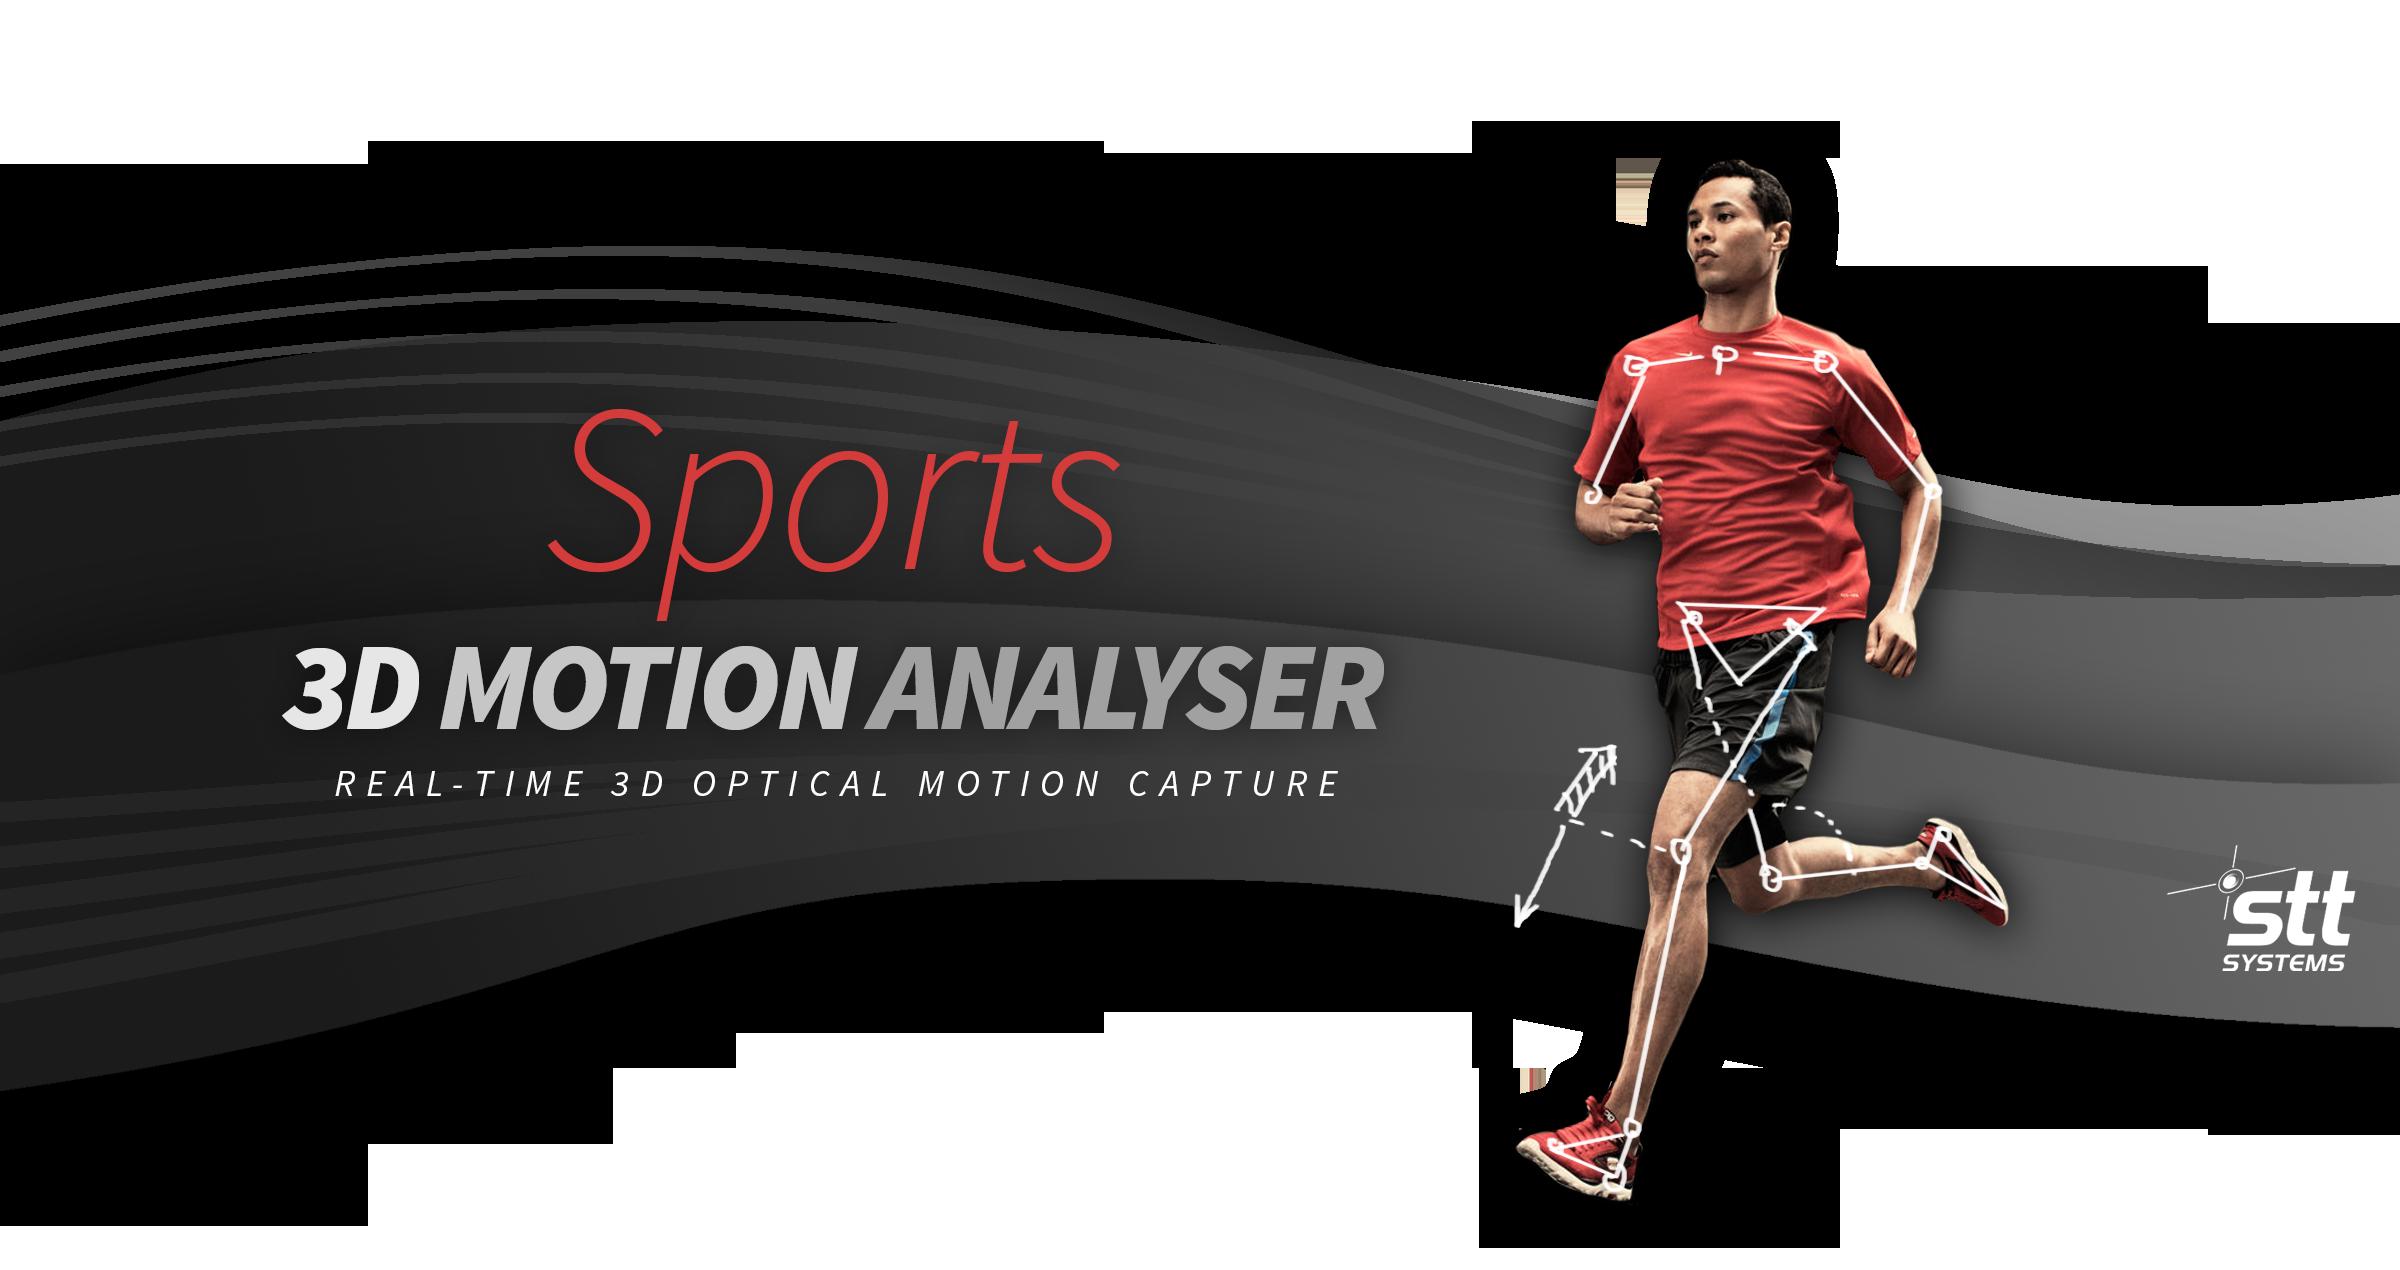 Sports_3DMotionAnalyser.png